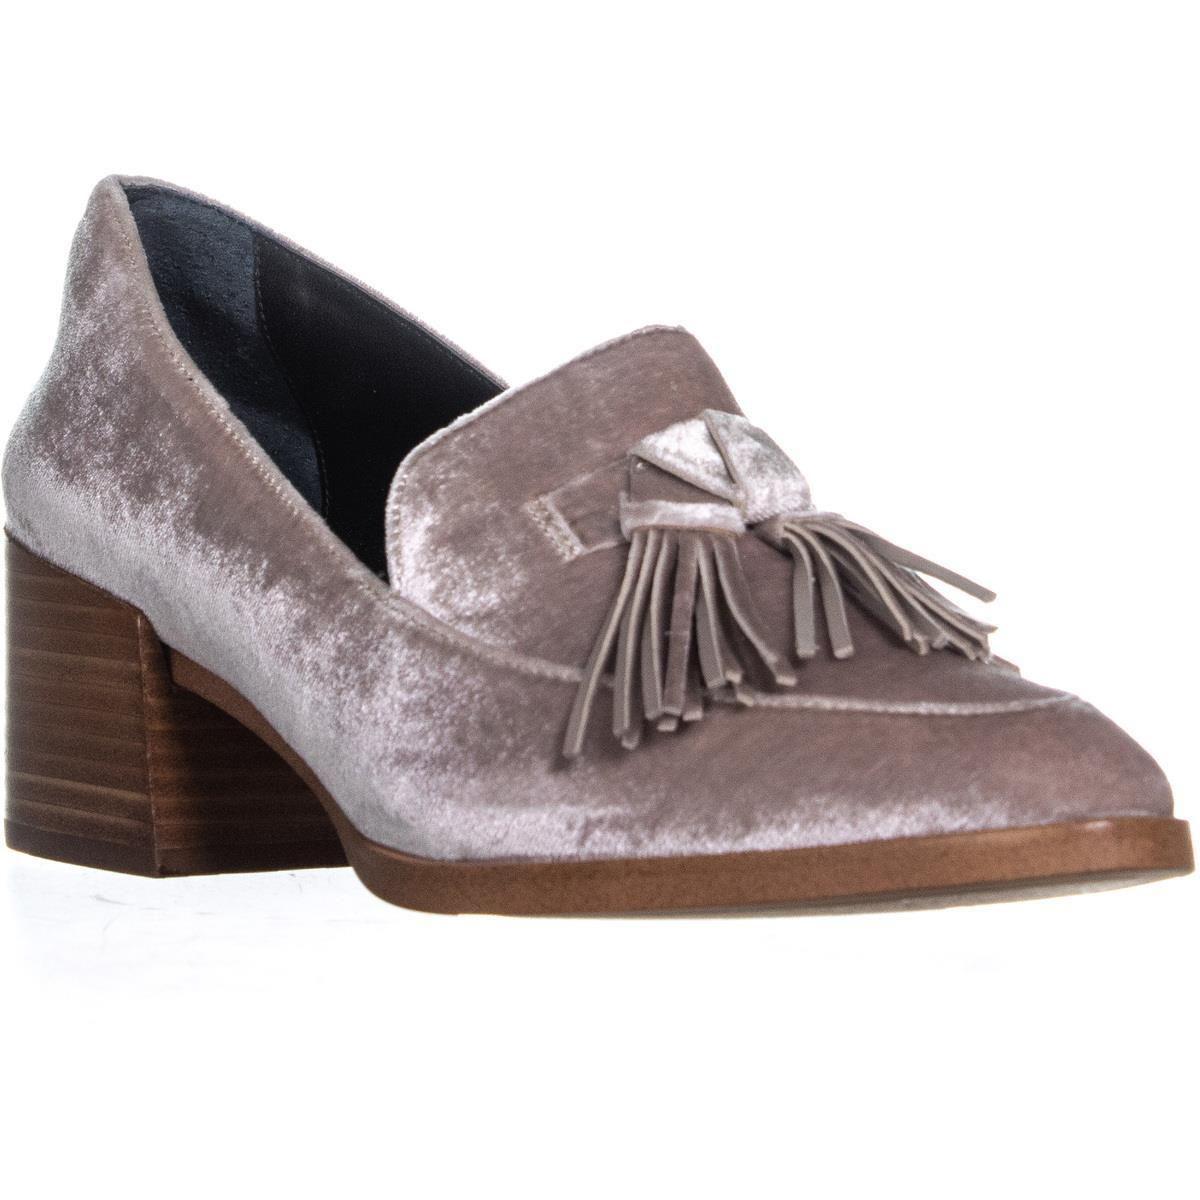 eb9e0037ce9 Rebecca Minkoff. Women s Edie Heeled Loafers ...